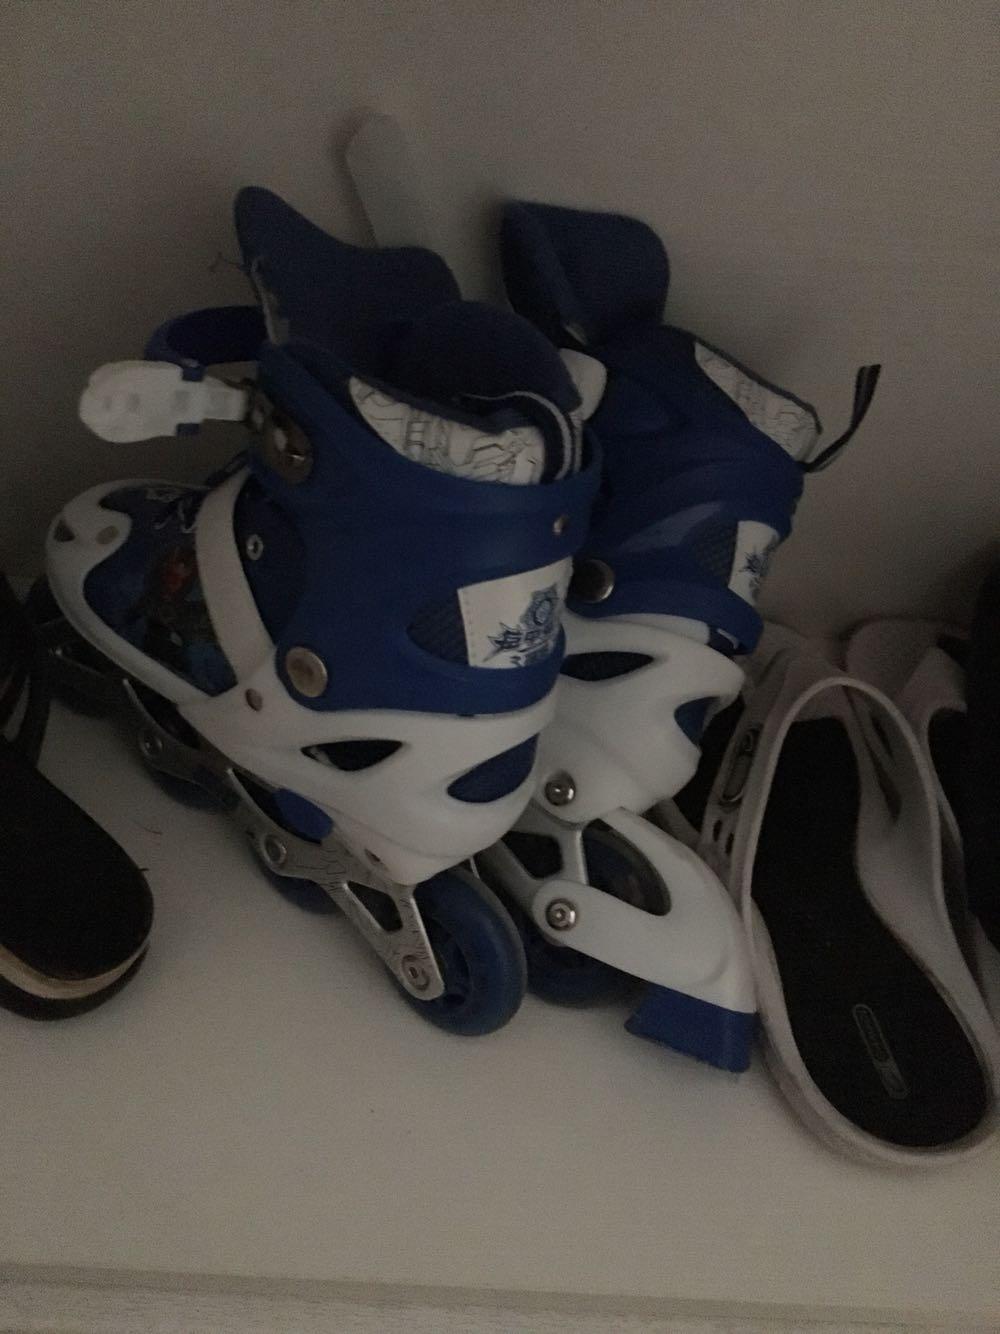 online sports shoes on sale 00278236 sale